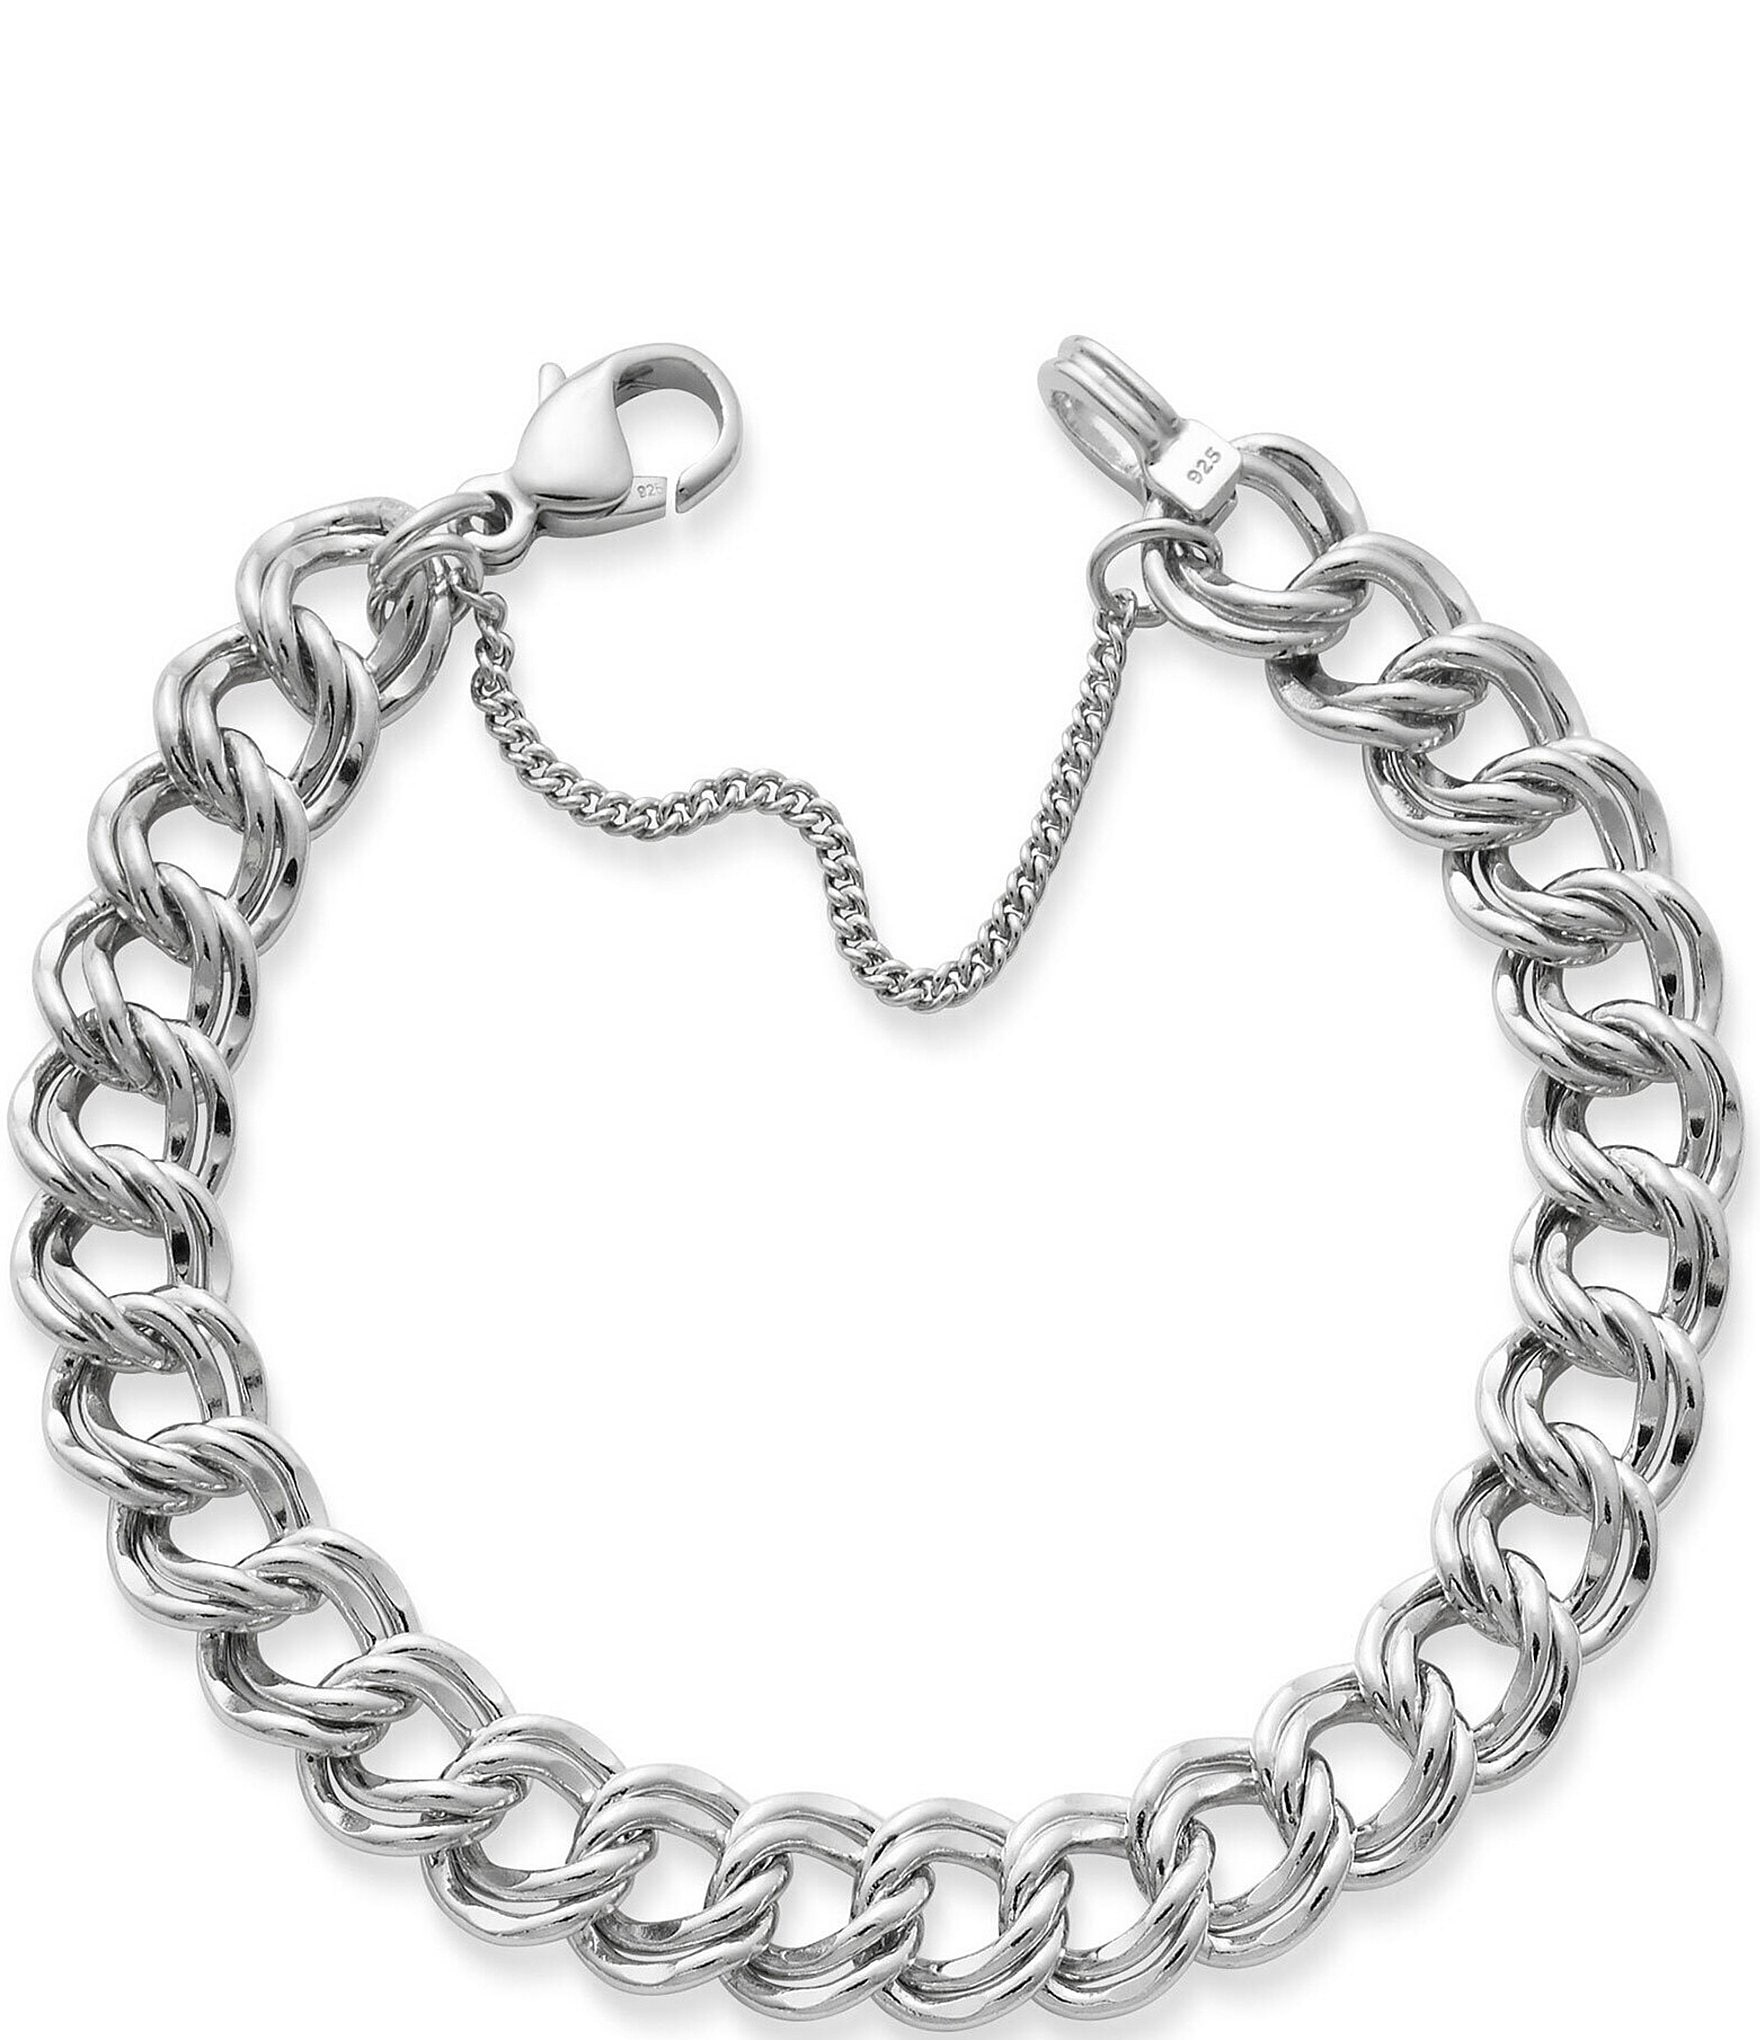 Pandora bracelet dillards - Pandora Bracelet Dillards 6